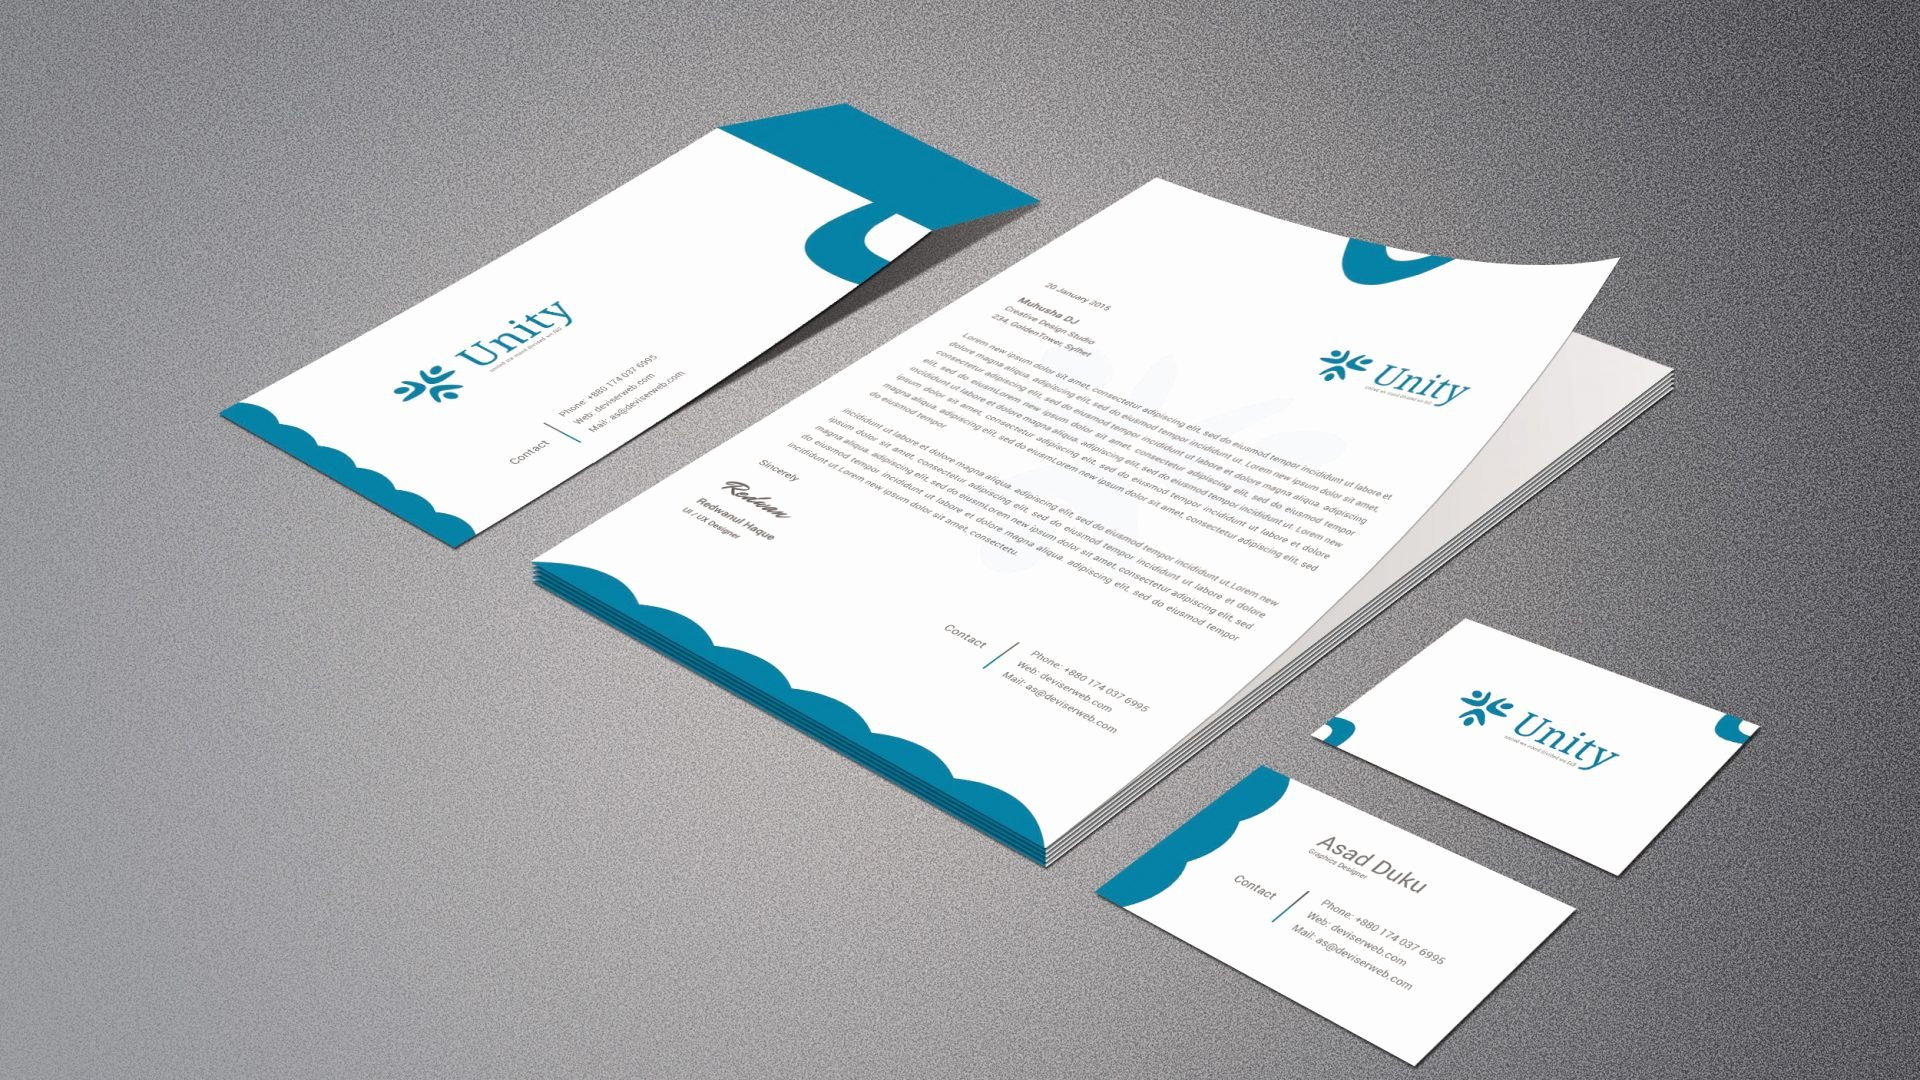 Business Card Template Illustrator Luxury 34 Beautiful Business Card Template Illustrator